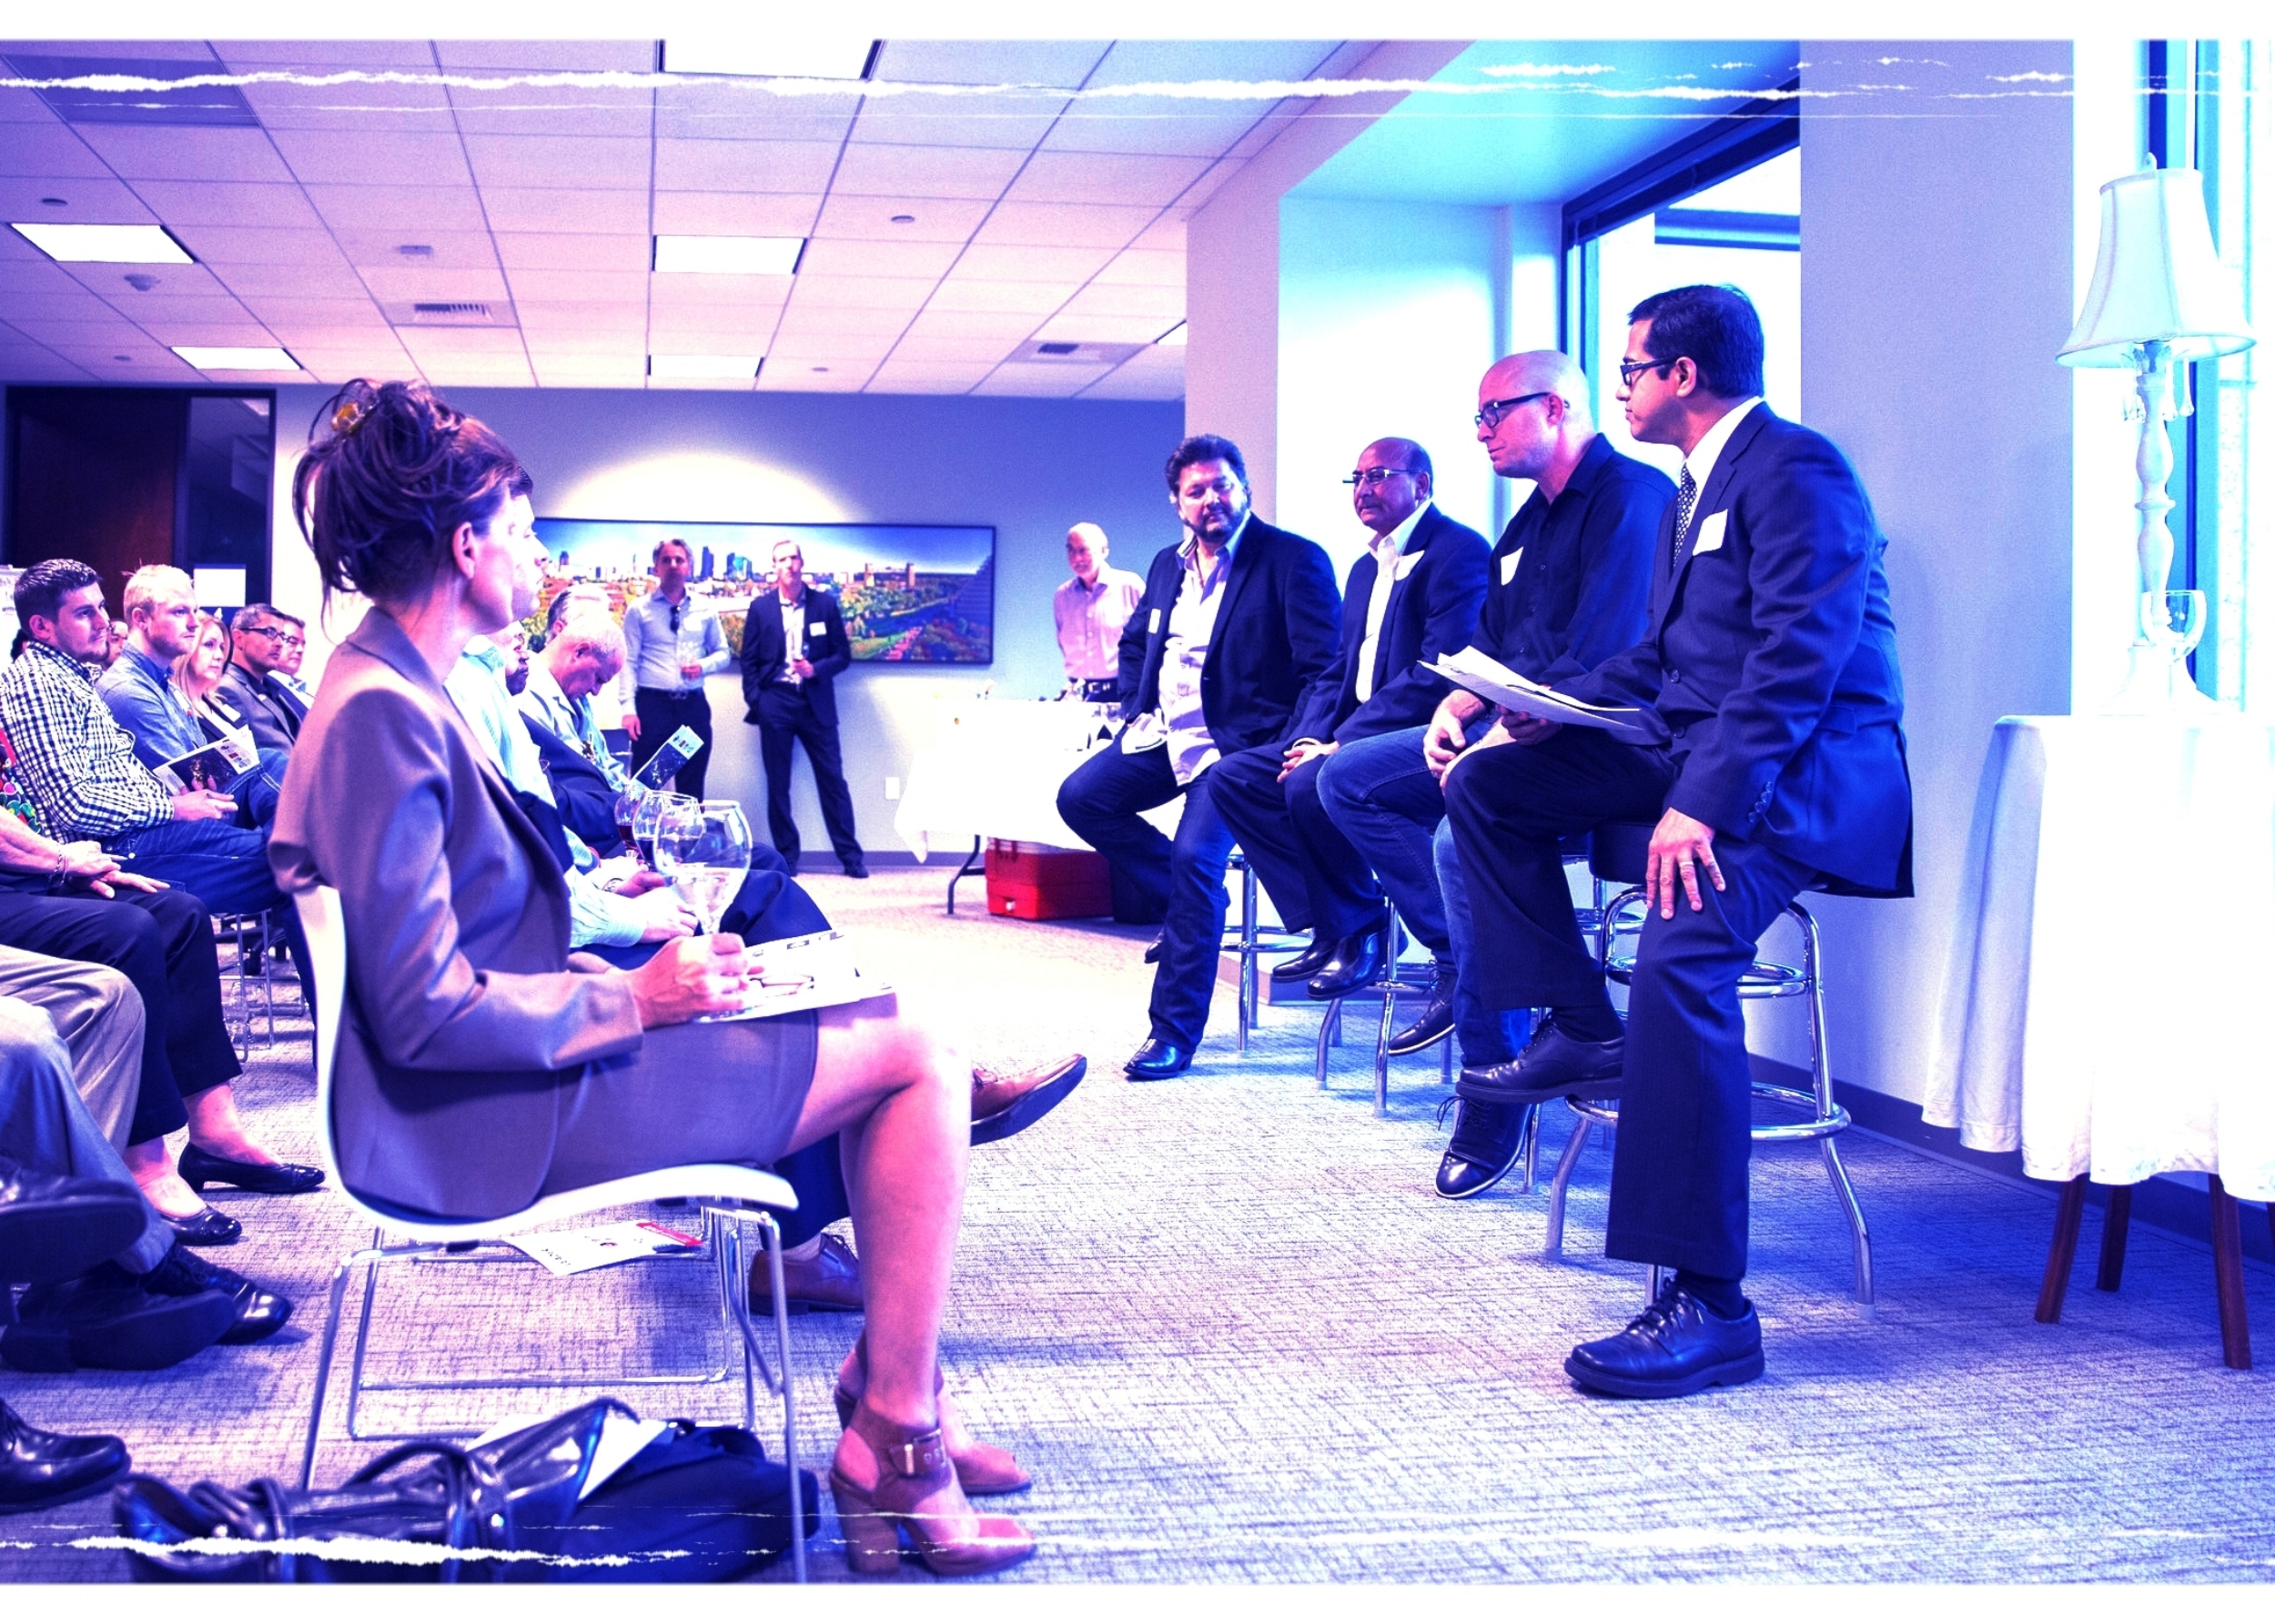 #BPIGlobalTalk - Advancing the dialogue